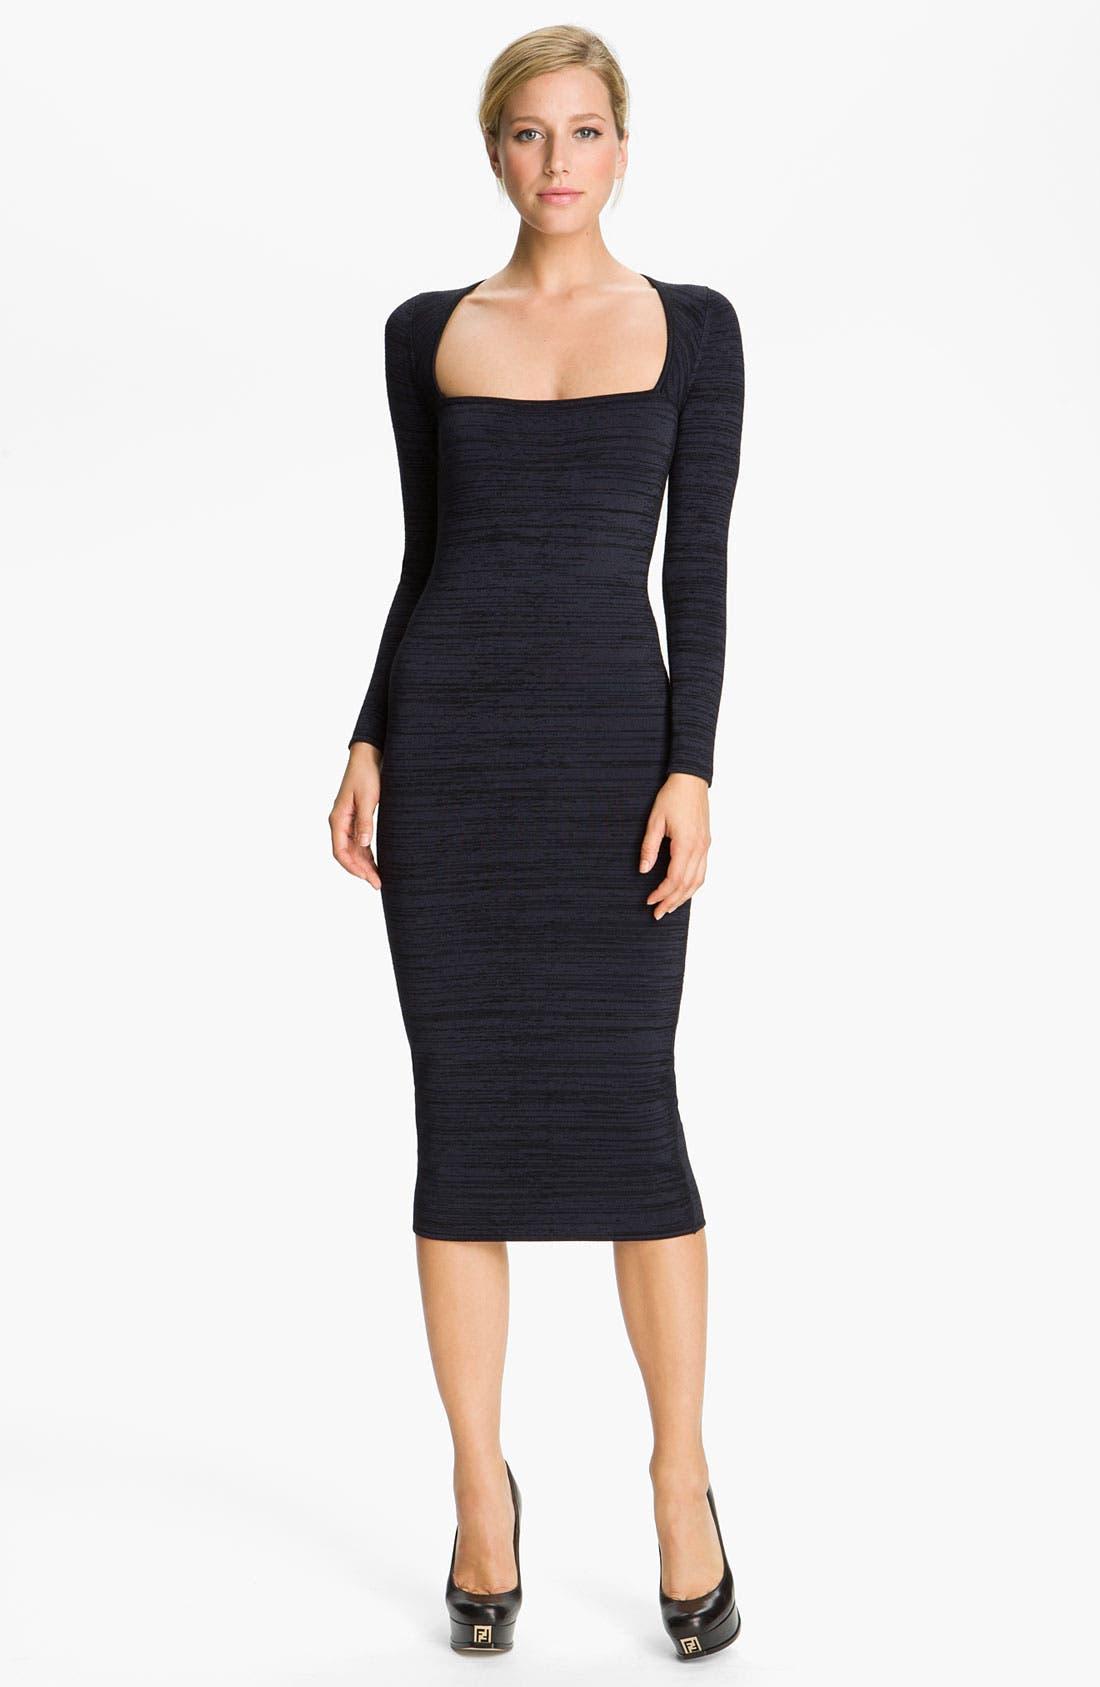 Alternate Image 1 Selected - A.L.C. 'Ree' Square Neck Dress